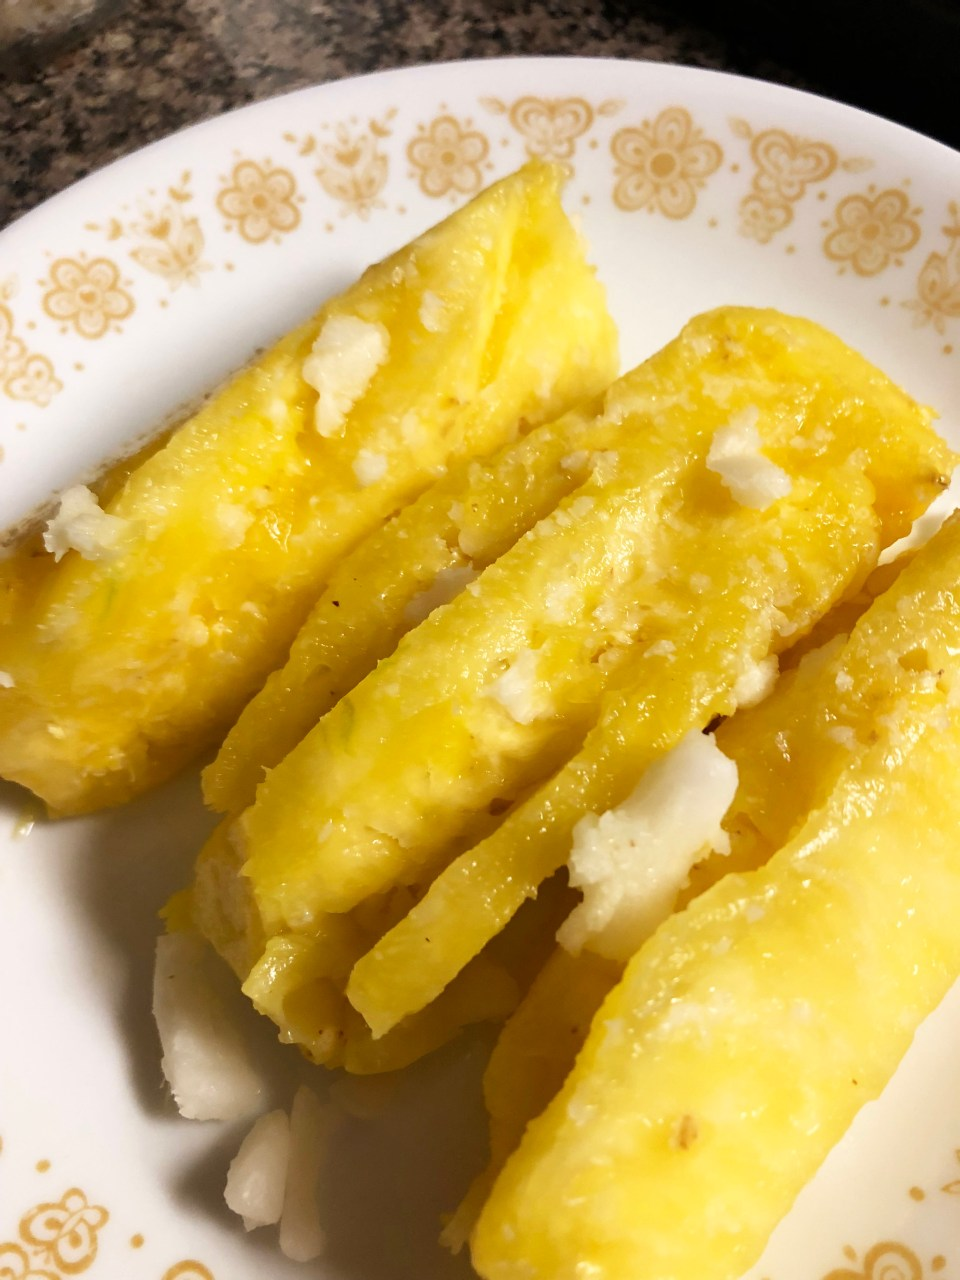 Pineapple + Coconut Oil